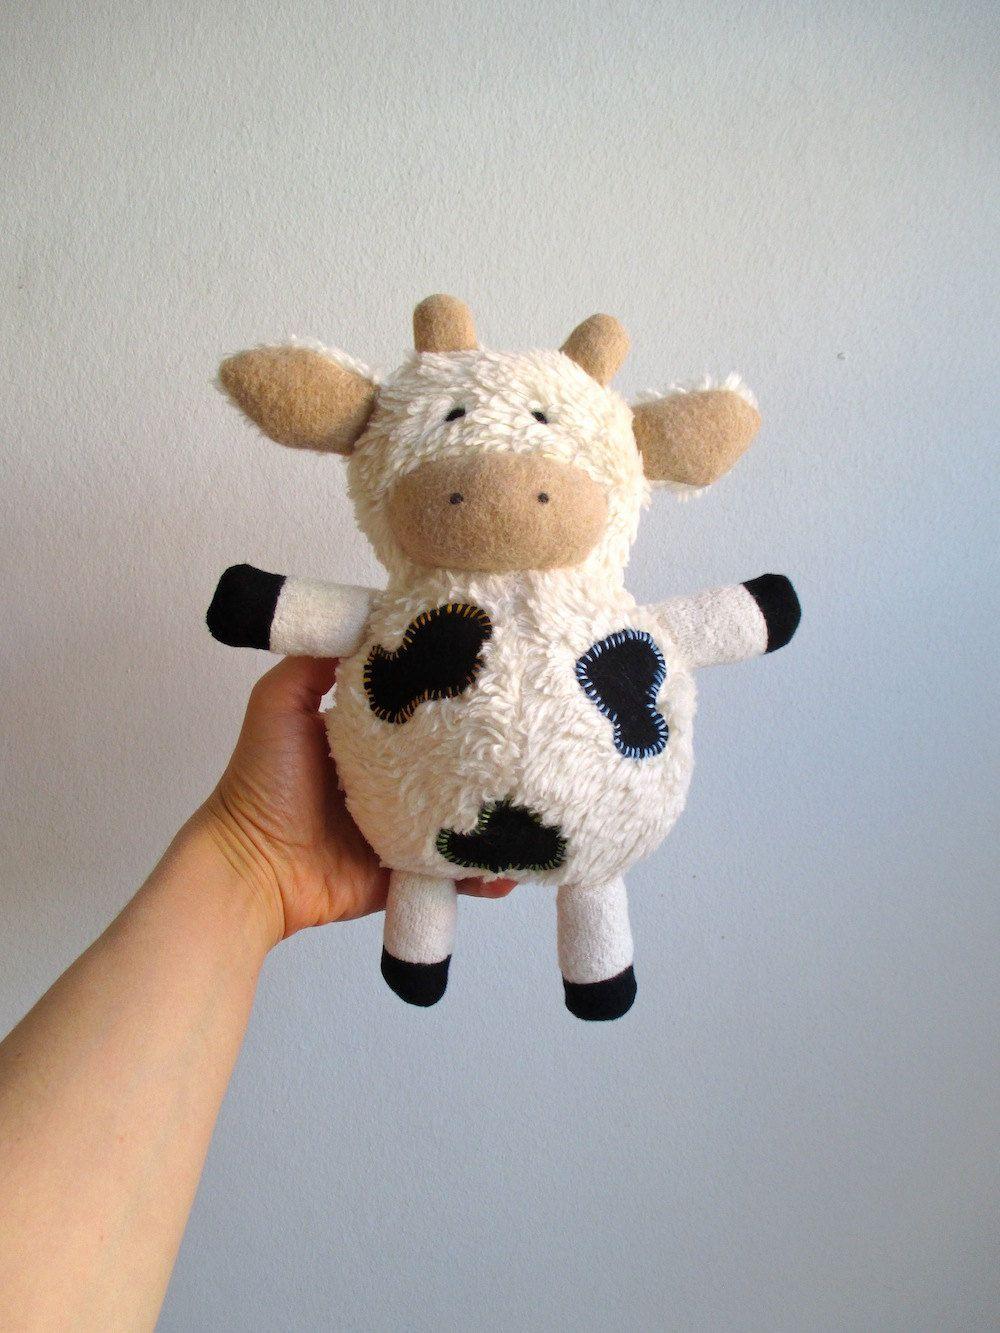 Organic cow toy, plush, stuffed animal, cuddly, soft, eco